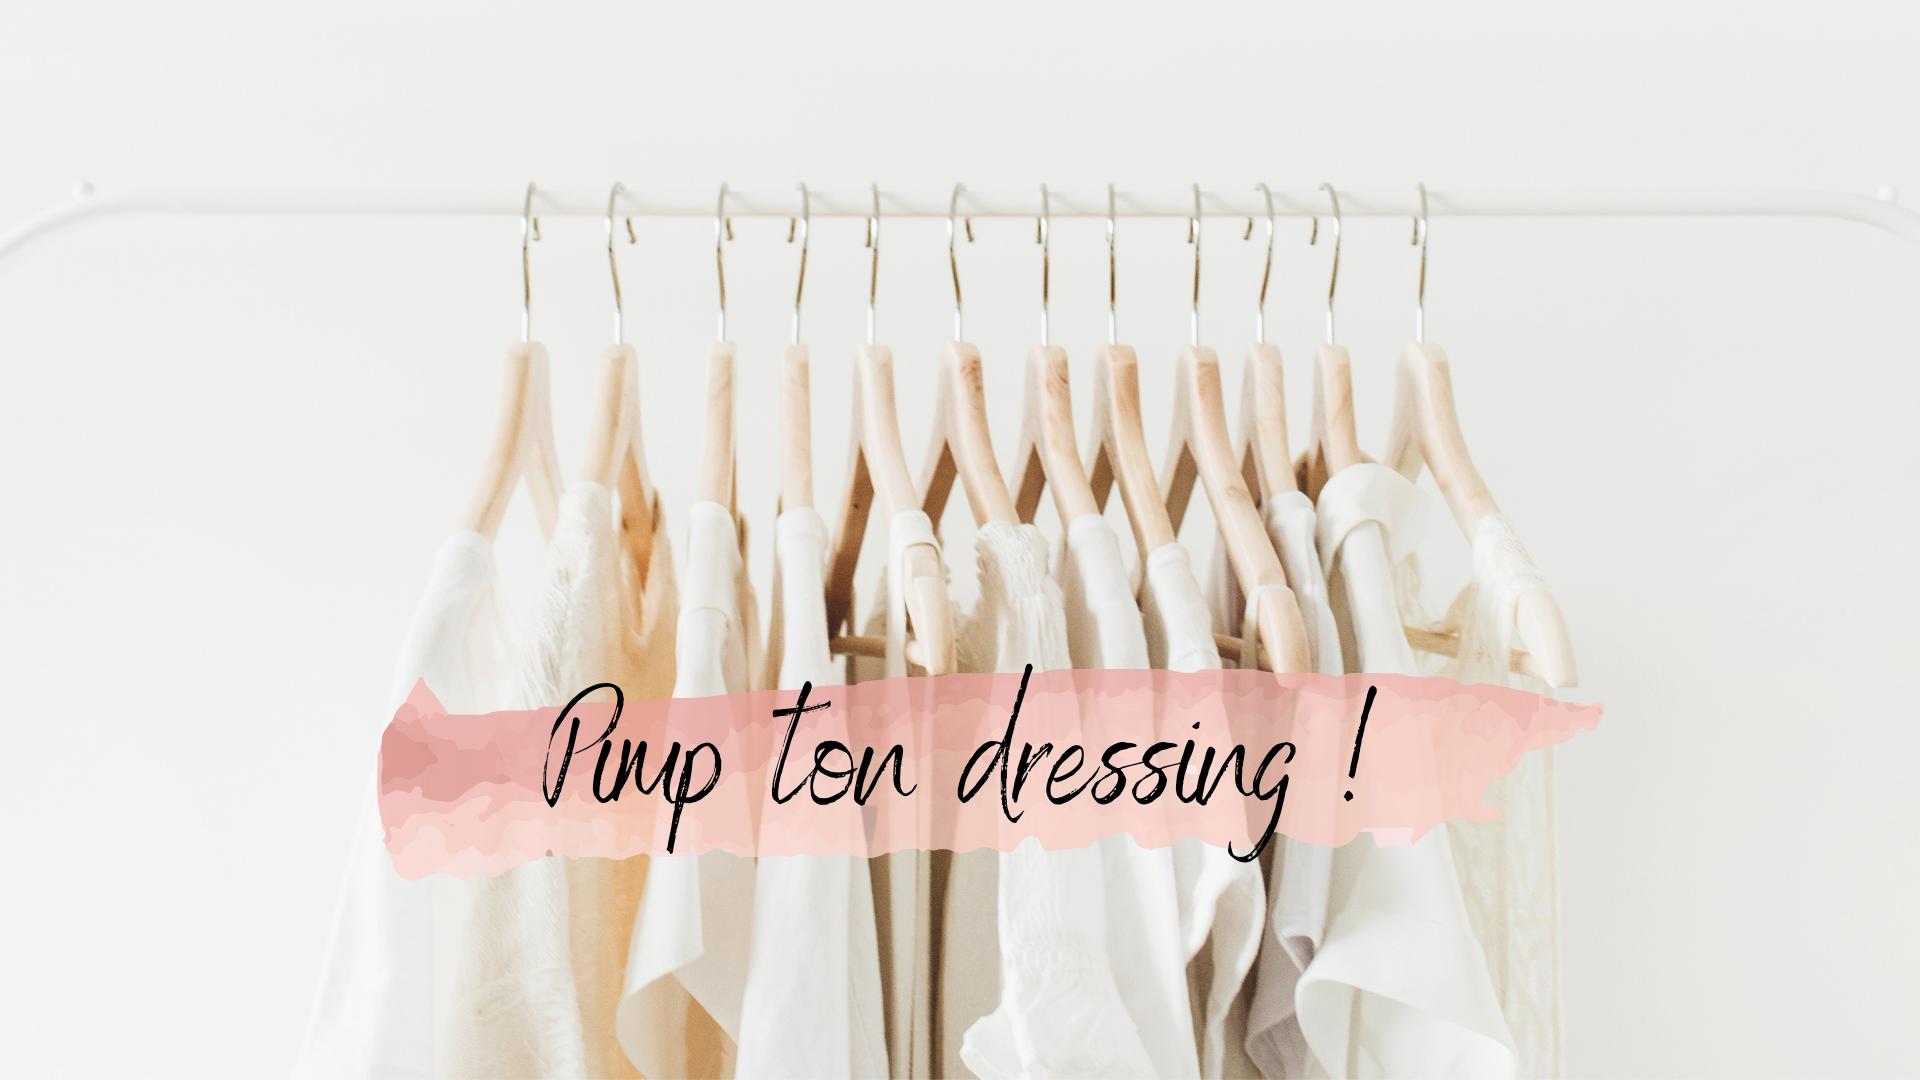 Pimp ton dressing !